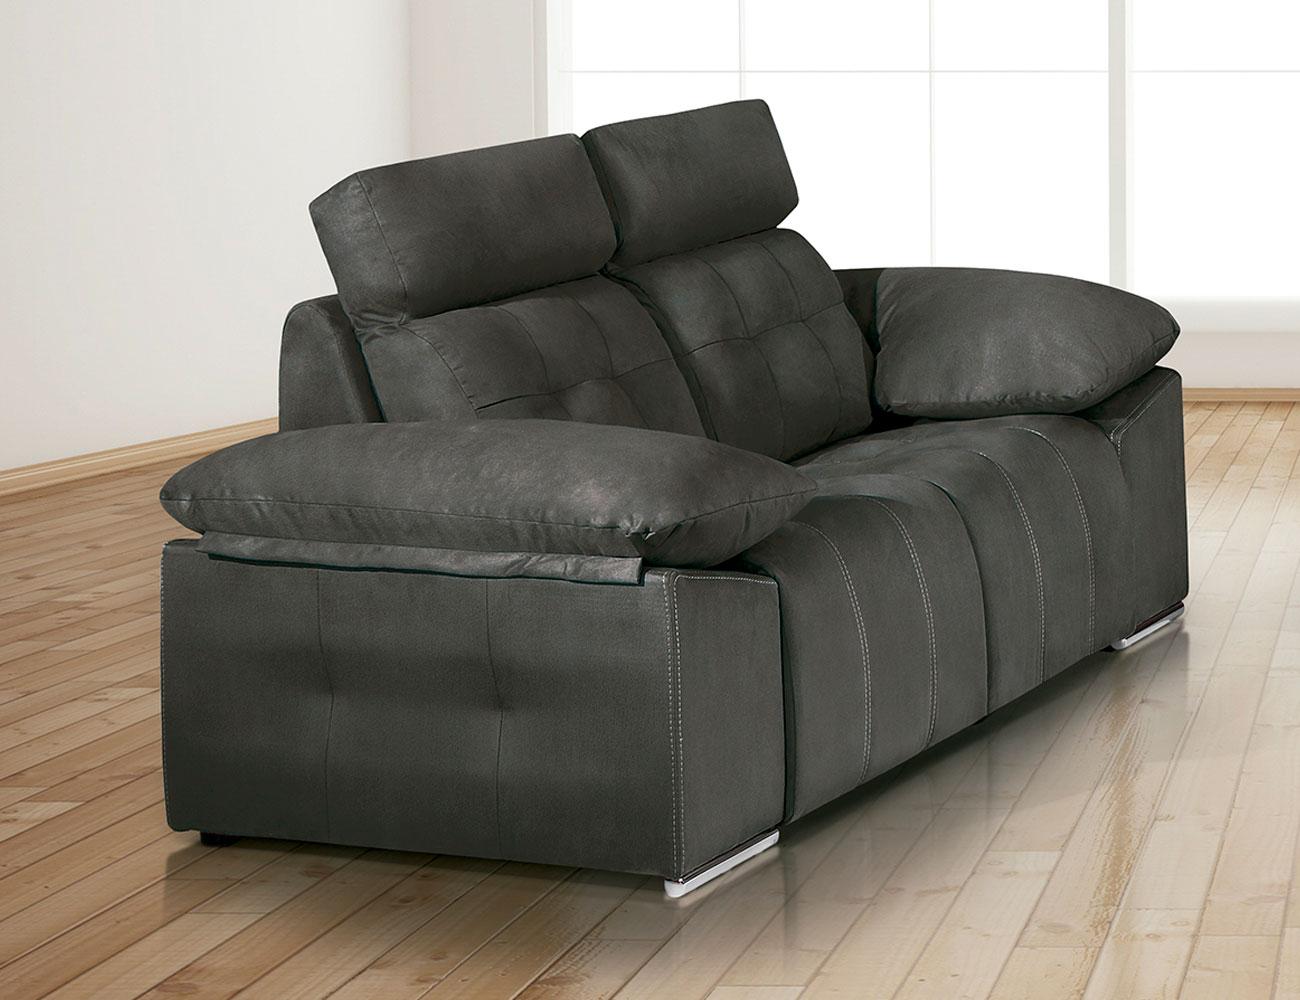 Sofa 2 plazas asientos capitone 180cm